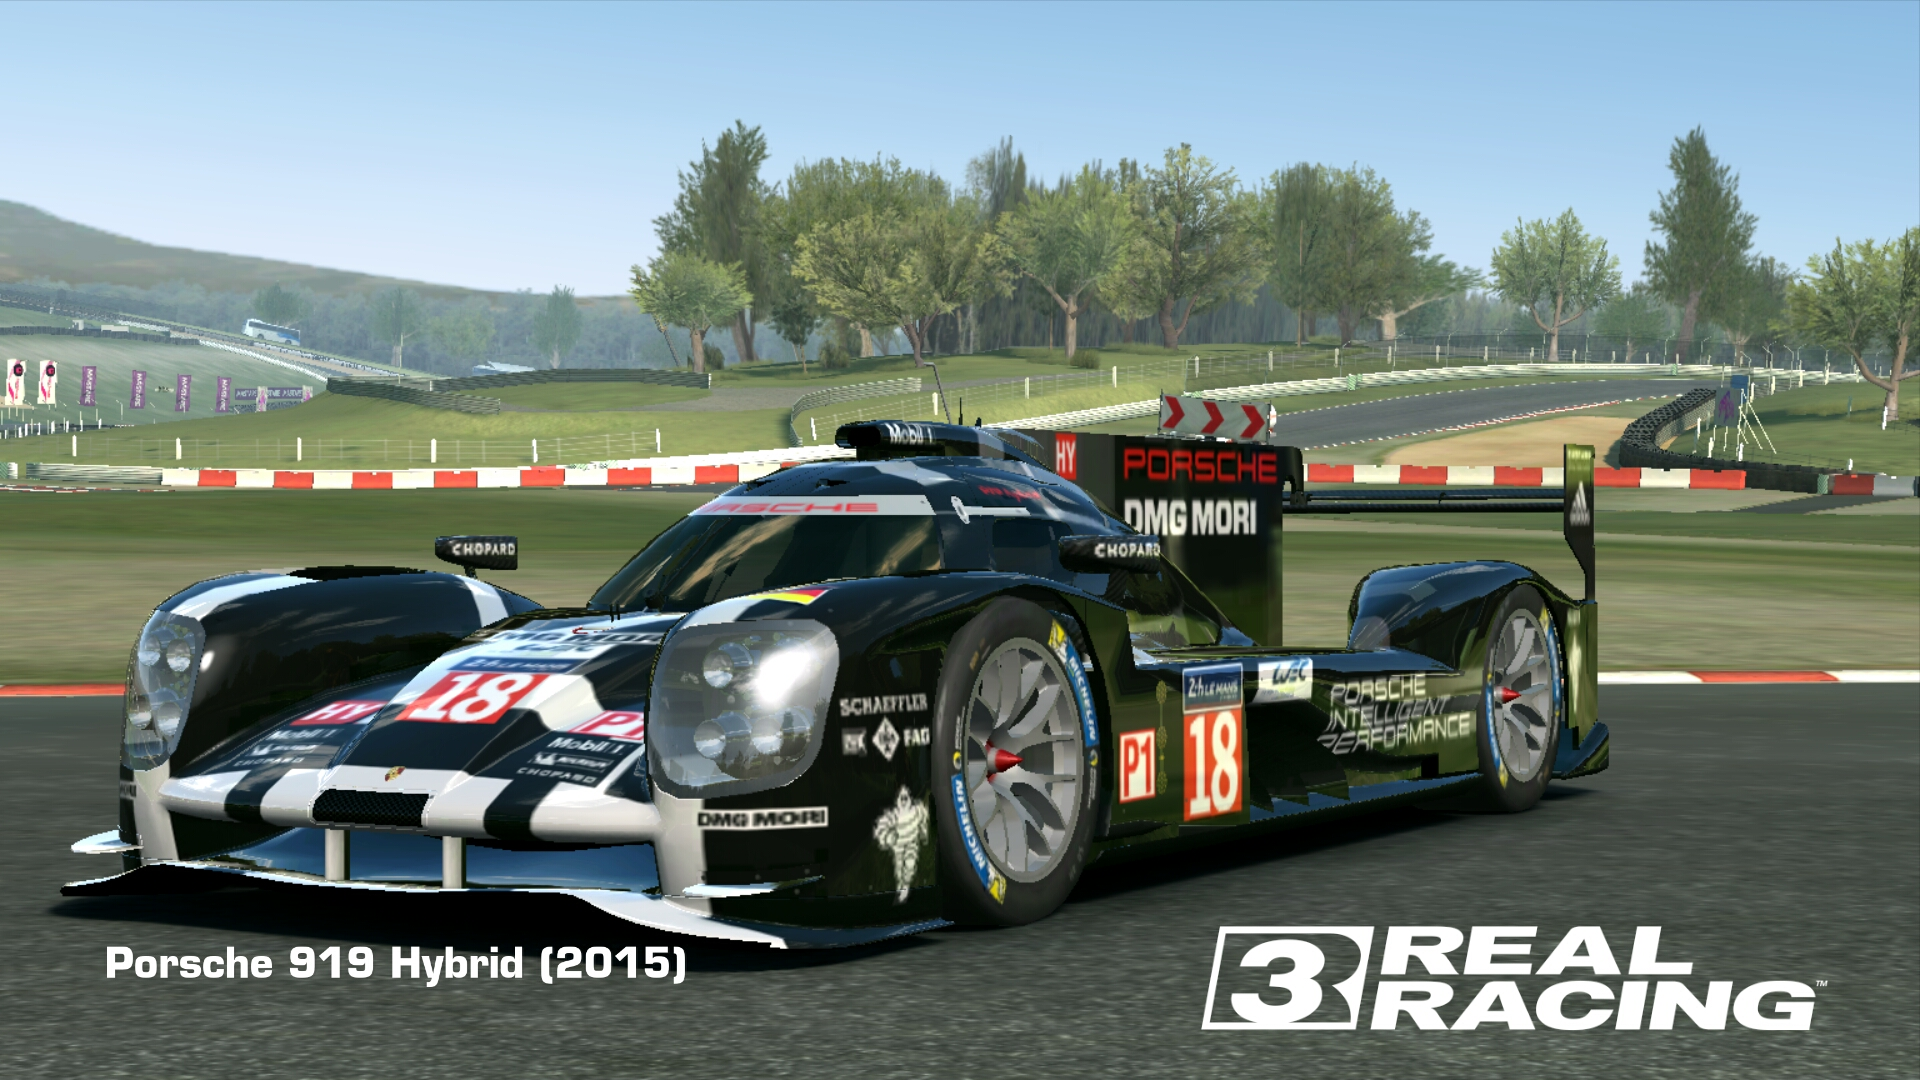 Audi r8 lms ultra rr3 8